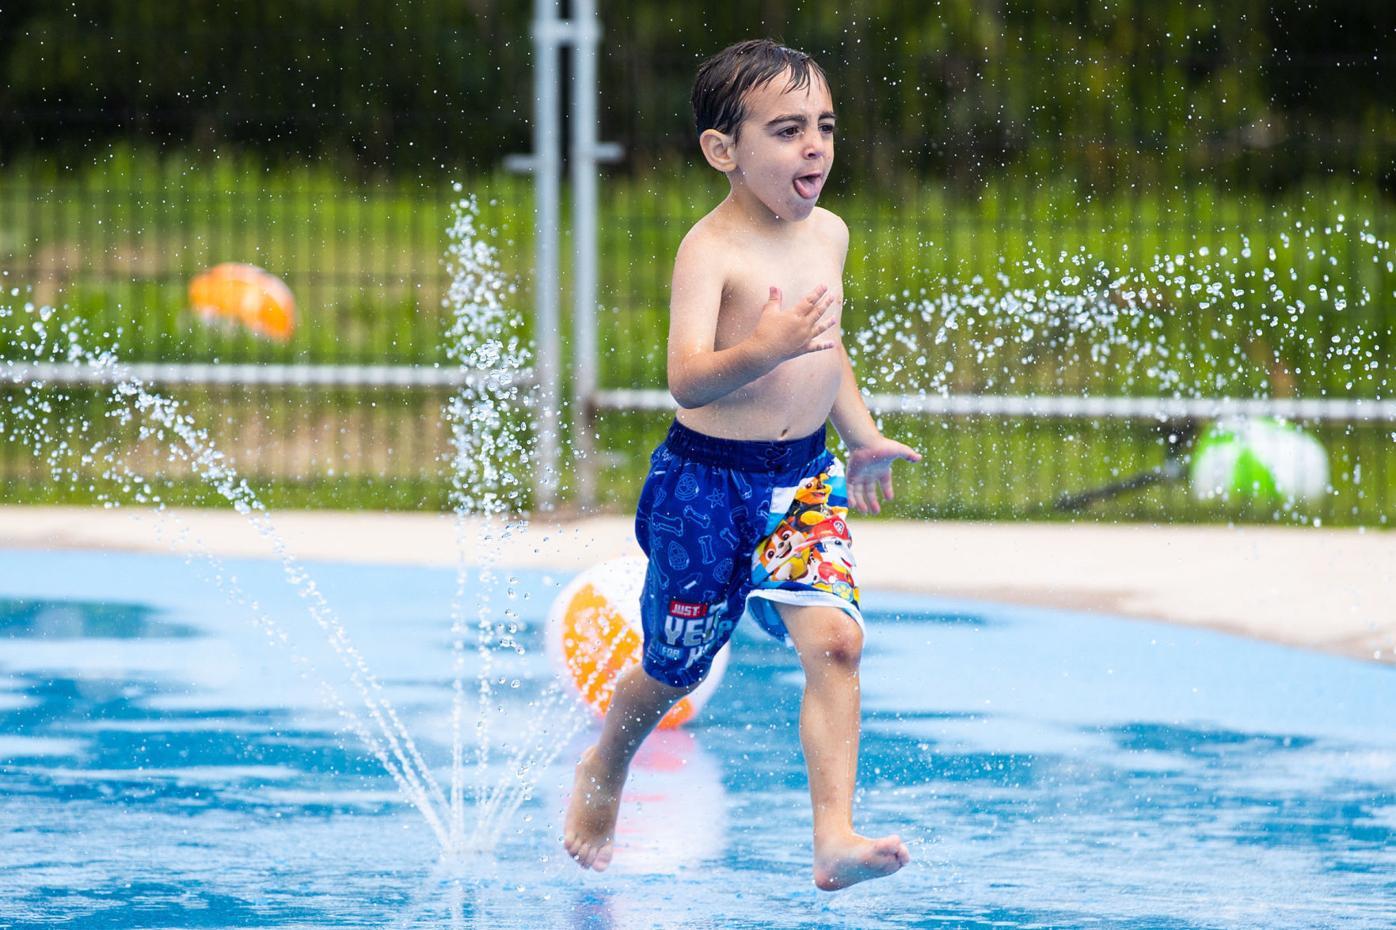 Making a splash in Scranton